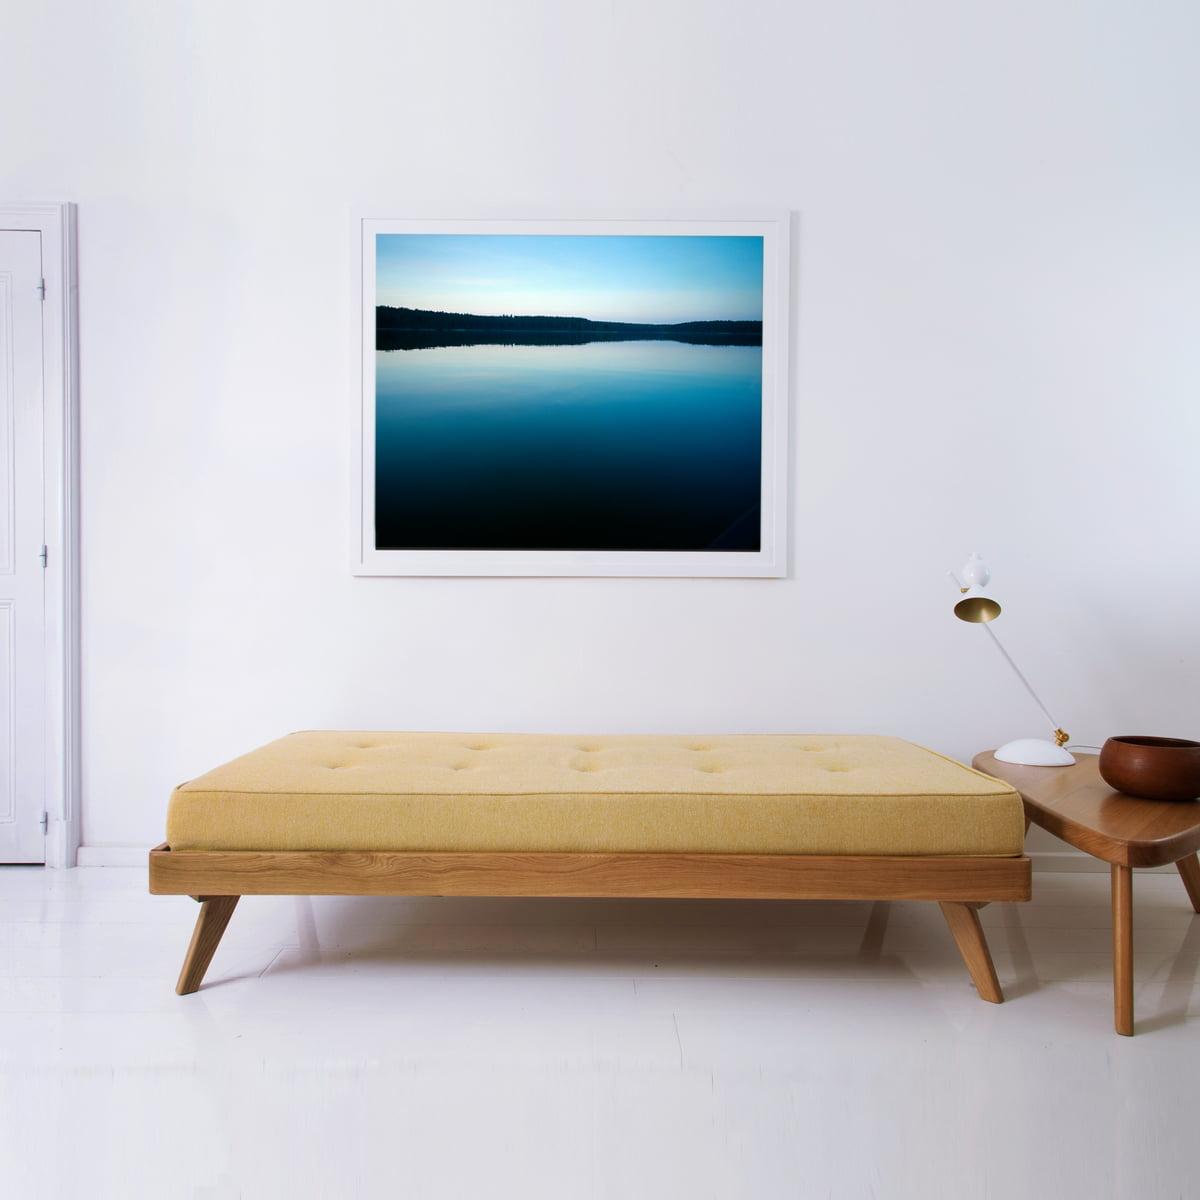 Daybed holz  Nightcouch by Gesa Hansen in the home design shop